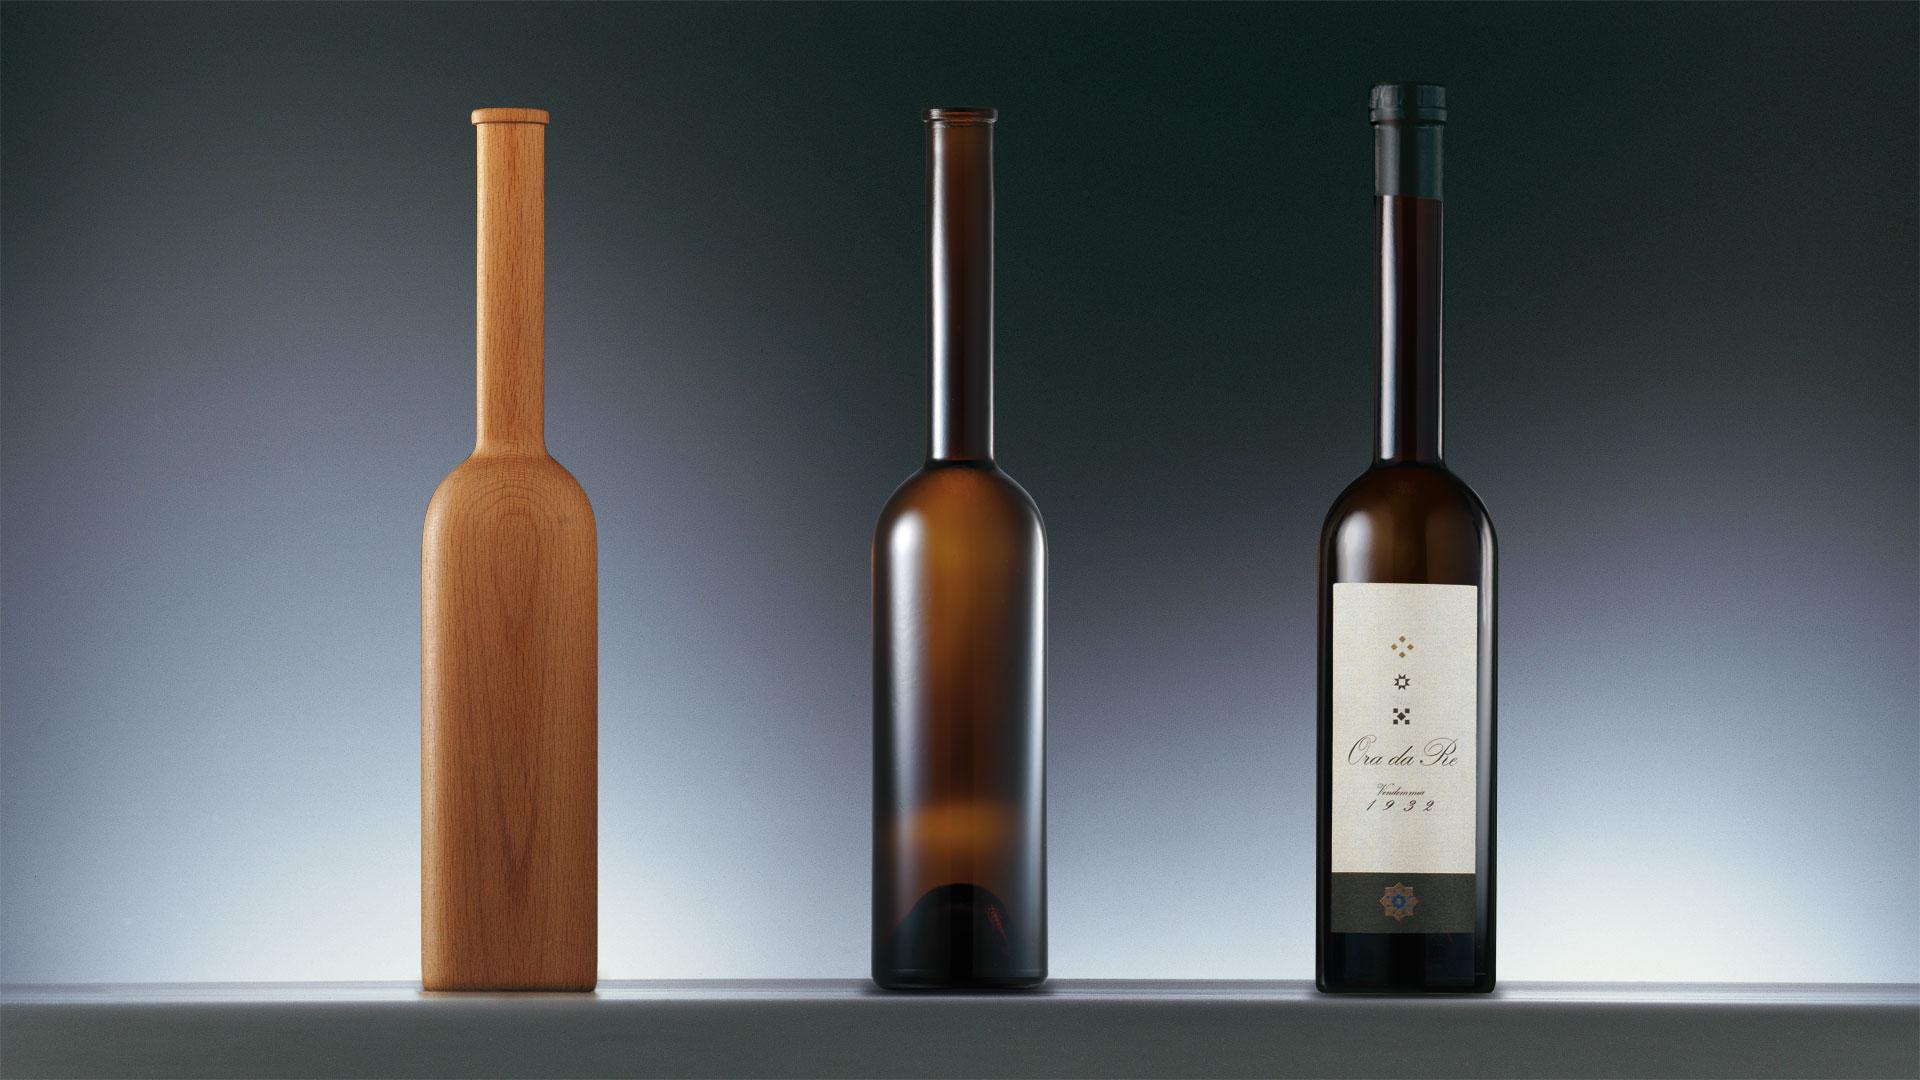 La Cantina dei Feudi bottle design 2